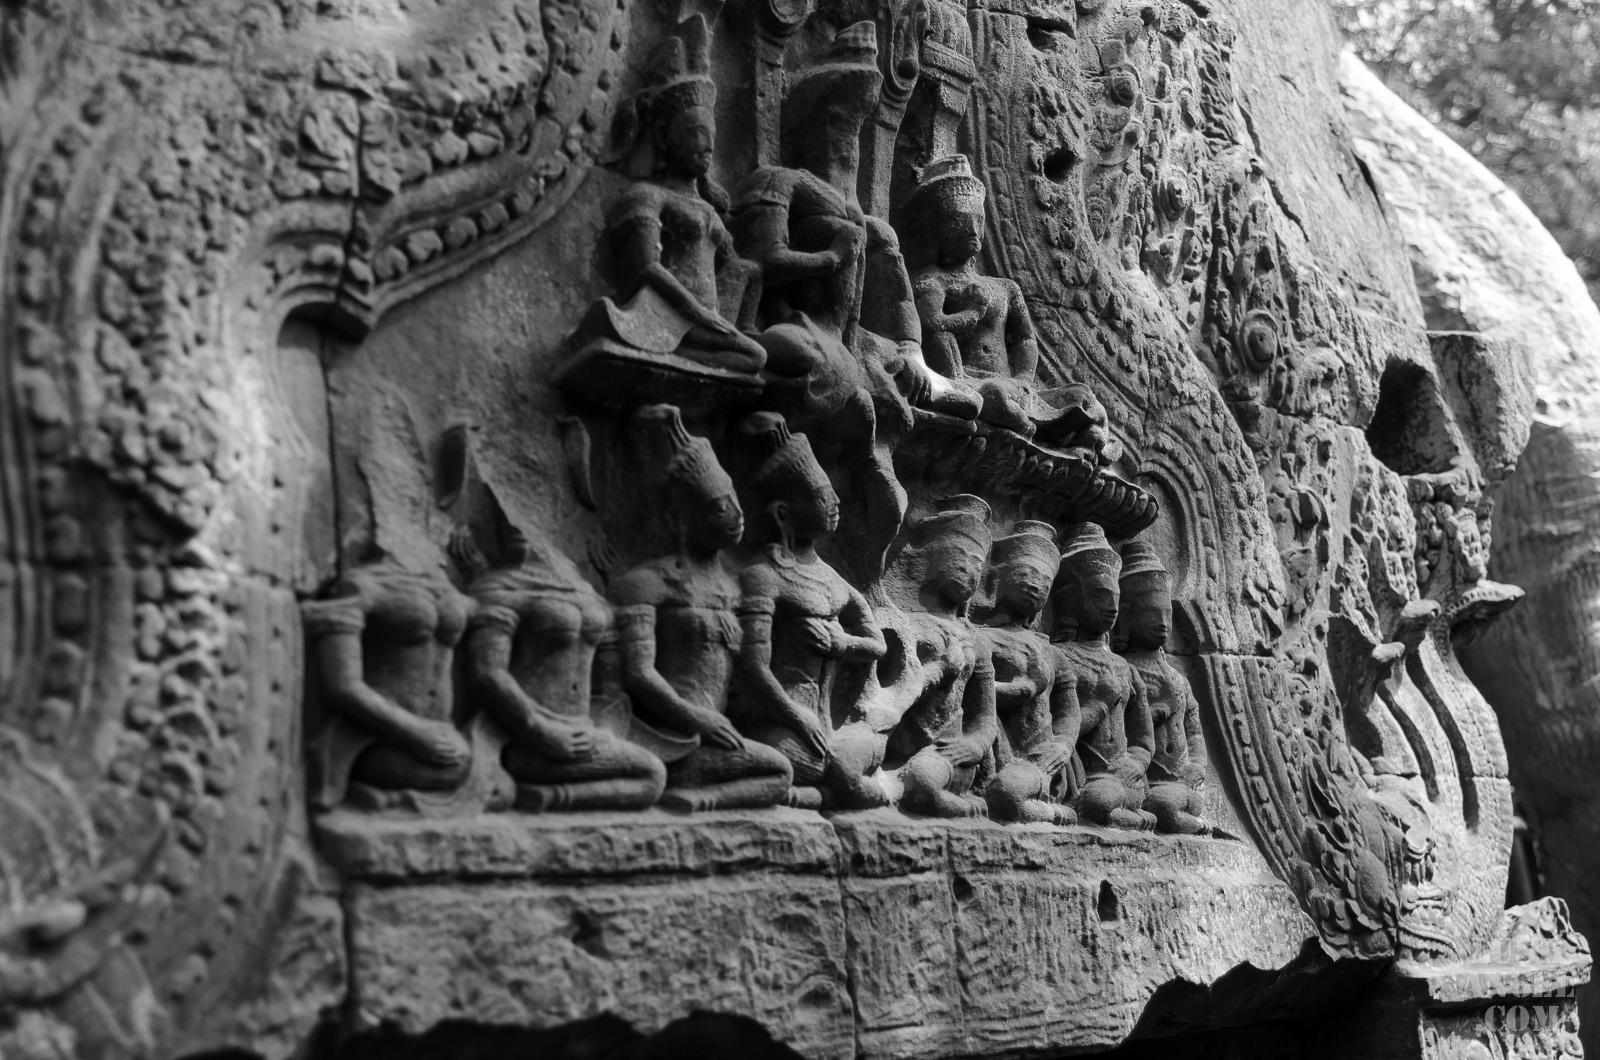 cambodia-siem-reap-23